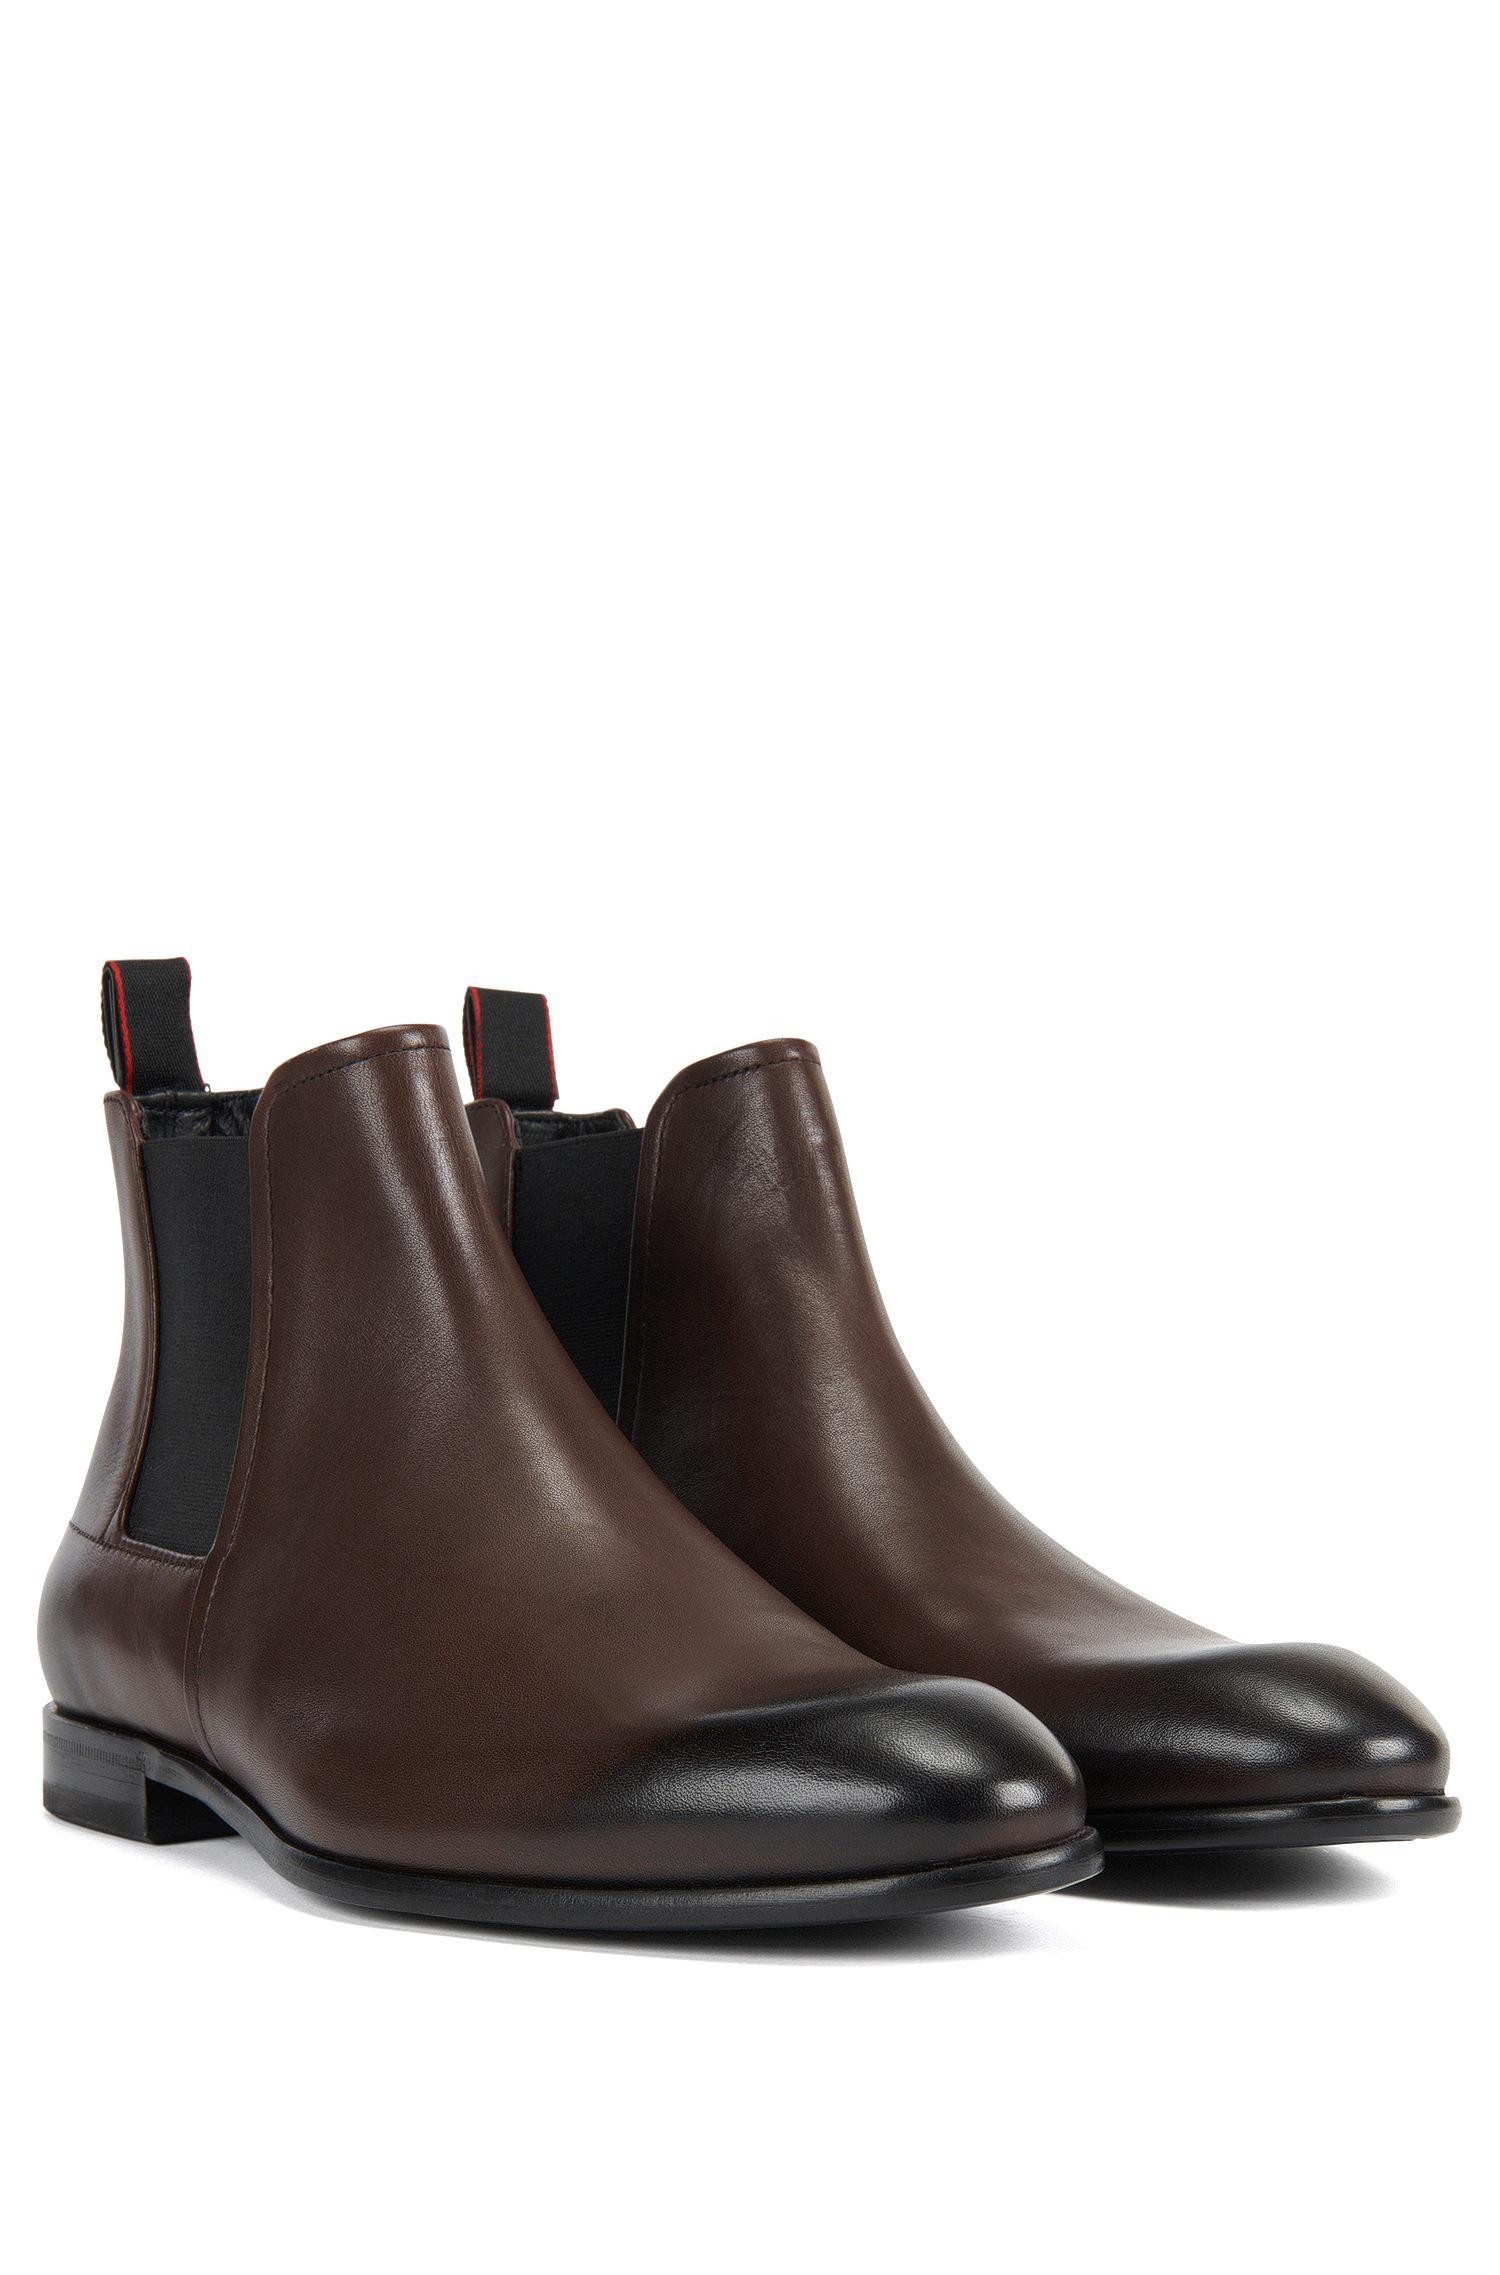 Formal Chelsea boots in rich leather HUGO BOSS KsP5b